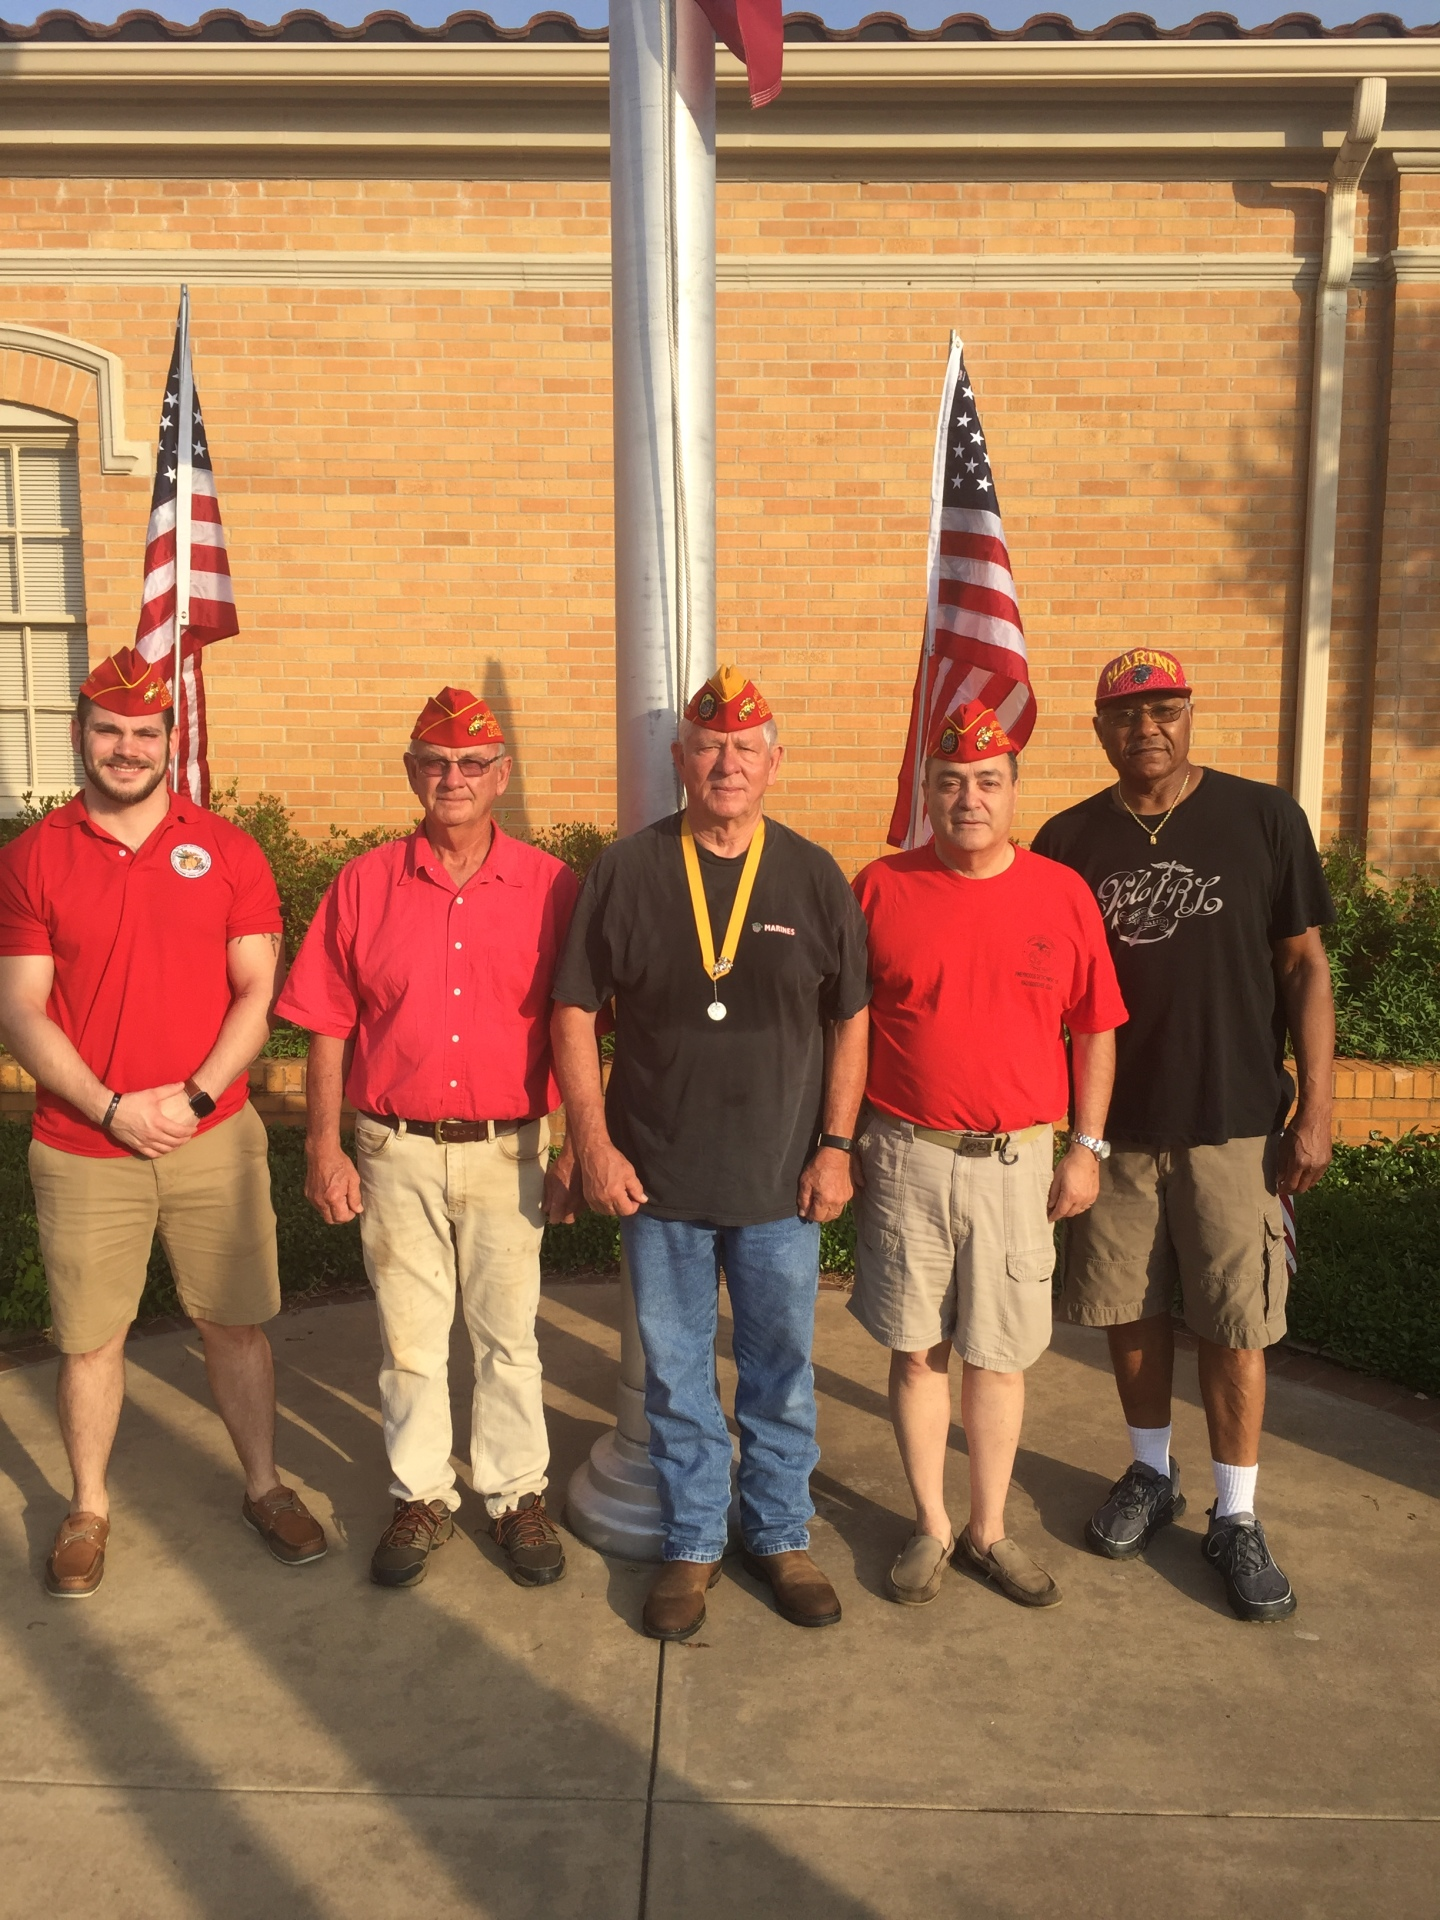 Lt-Rt; Michael Widenhouse, Steve Lee, Dan Singletary, Manny Guerrero, George Deckard